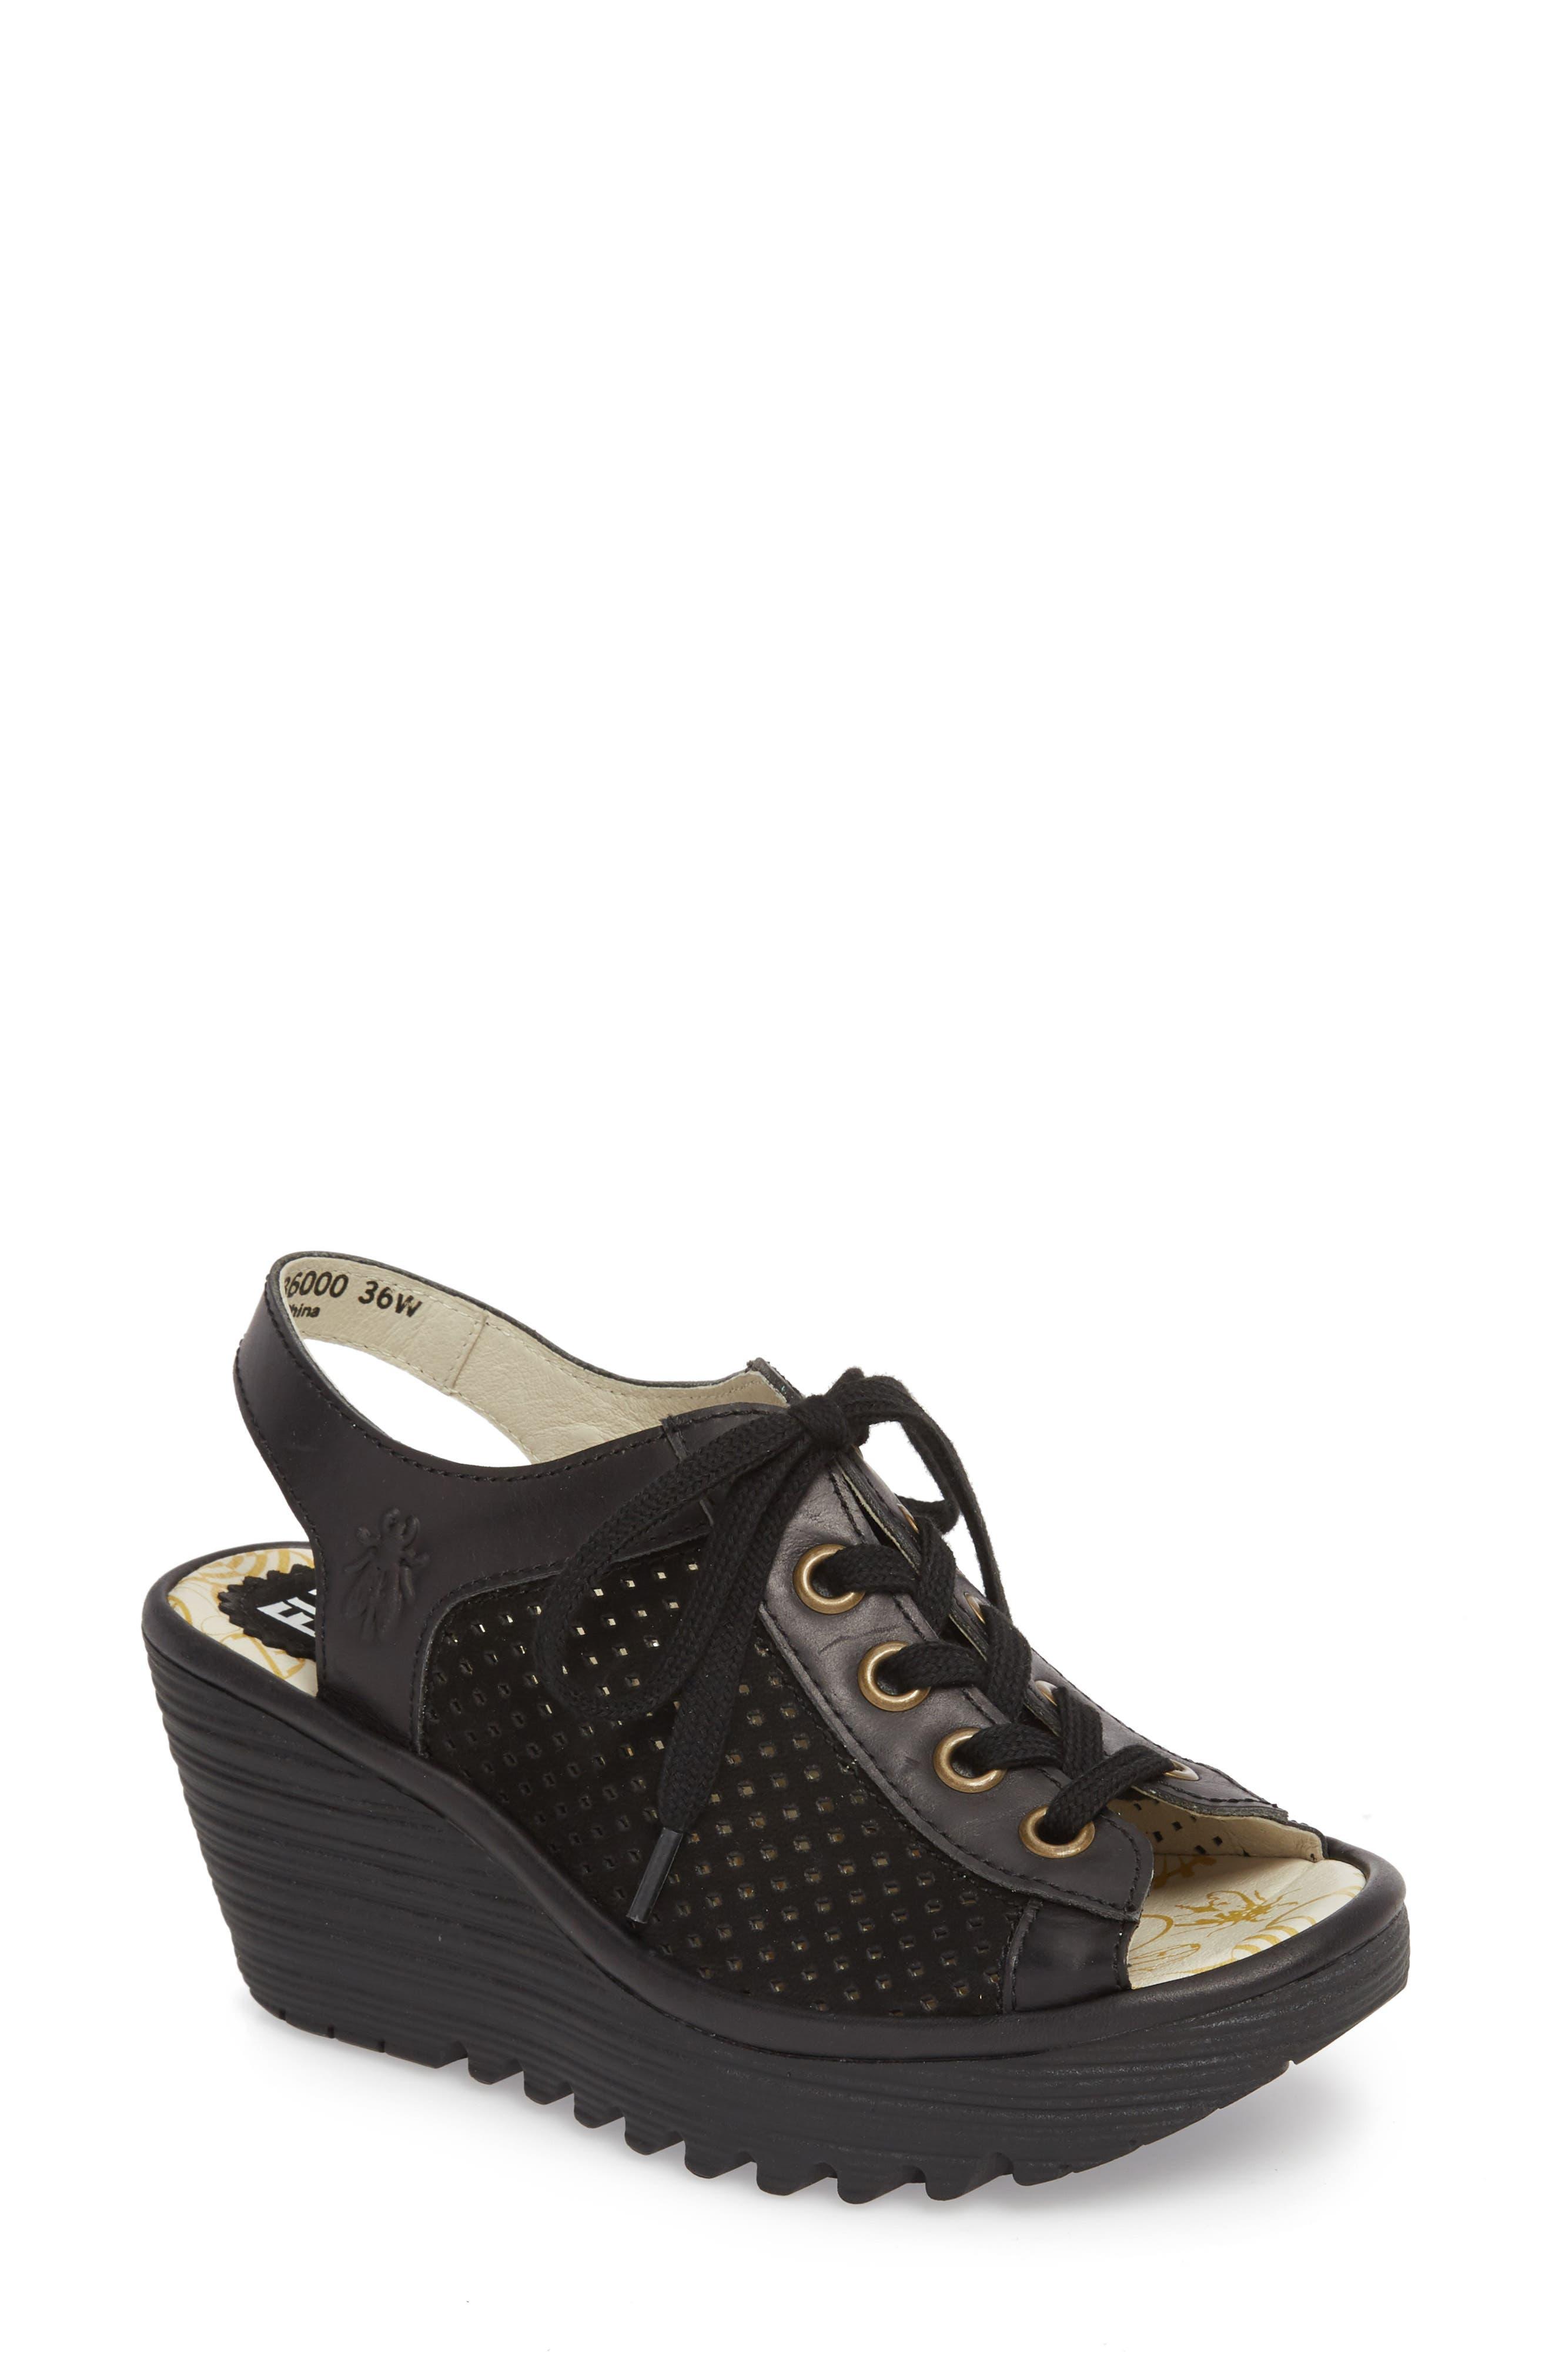 FLY LONDON Yeki Sandal, Main, color, BLACK CUPIDO/ RUG LEATHER